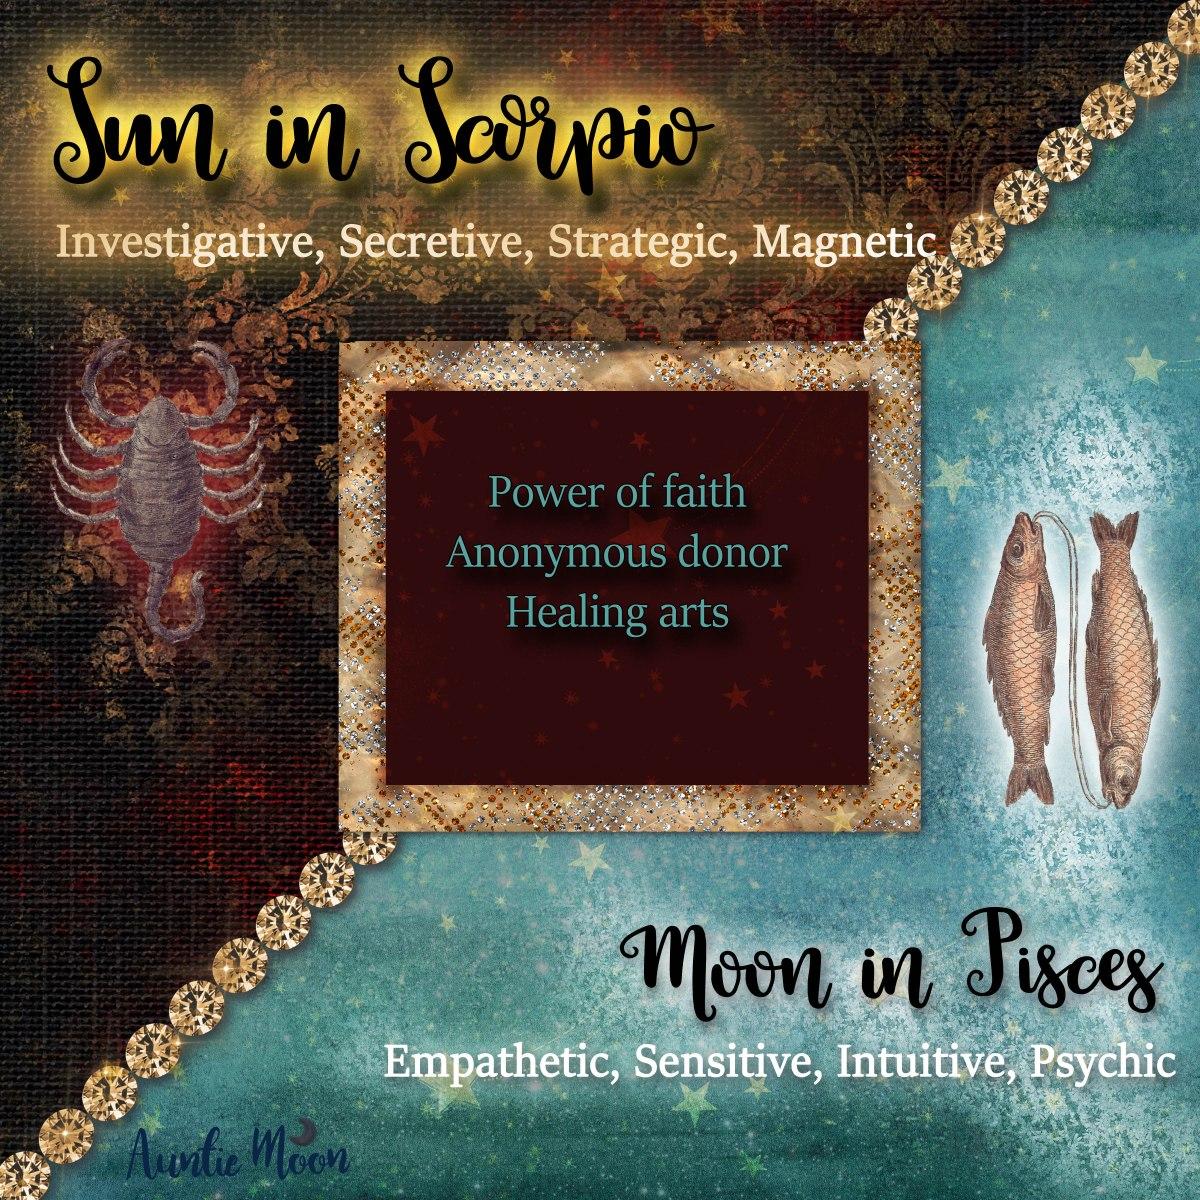 Sun in Scorpio ~ Moon in Pisces